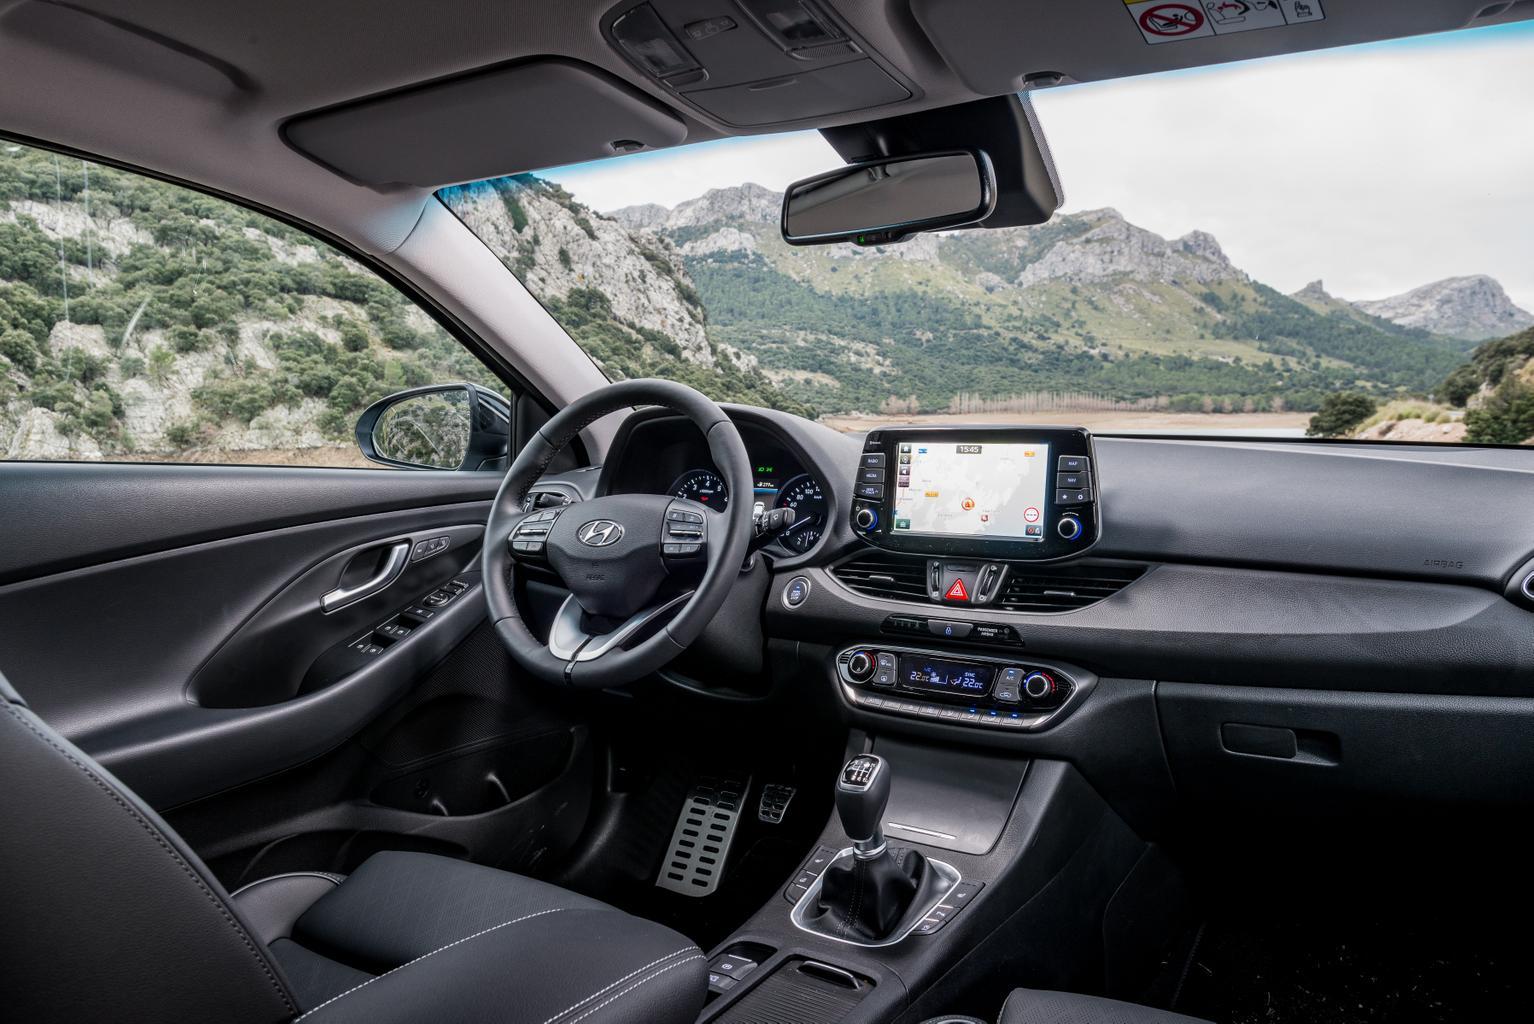 2018 Hyundai i30 Fastback review - price, specs and verdict